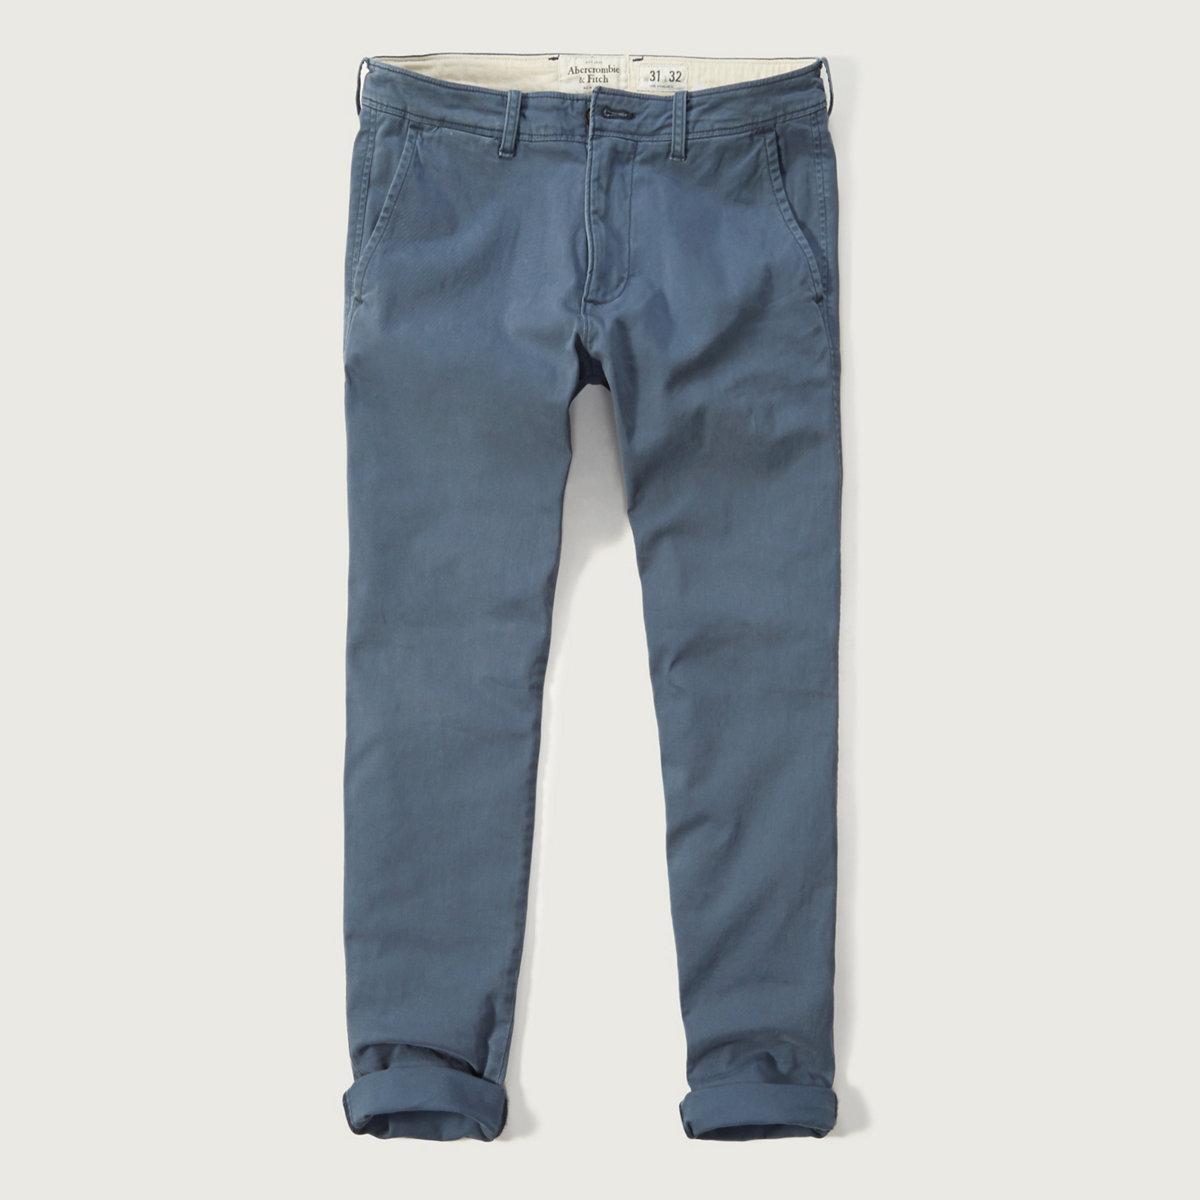 Super Skinny Chino Pants